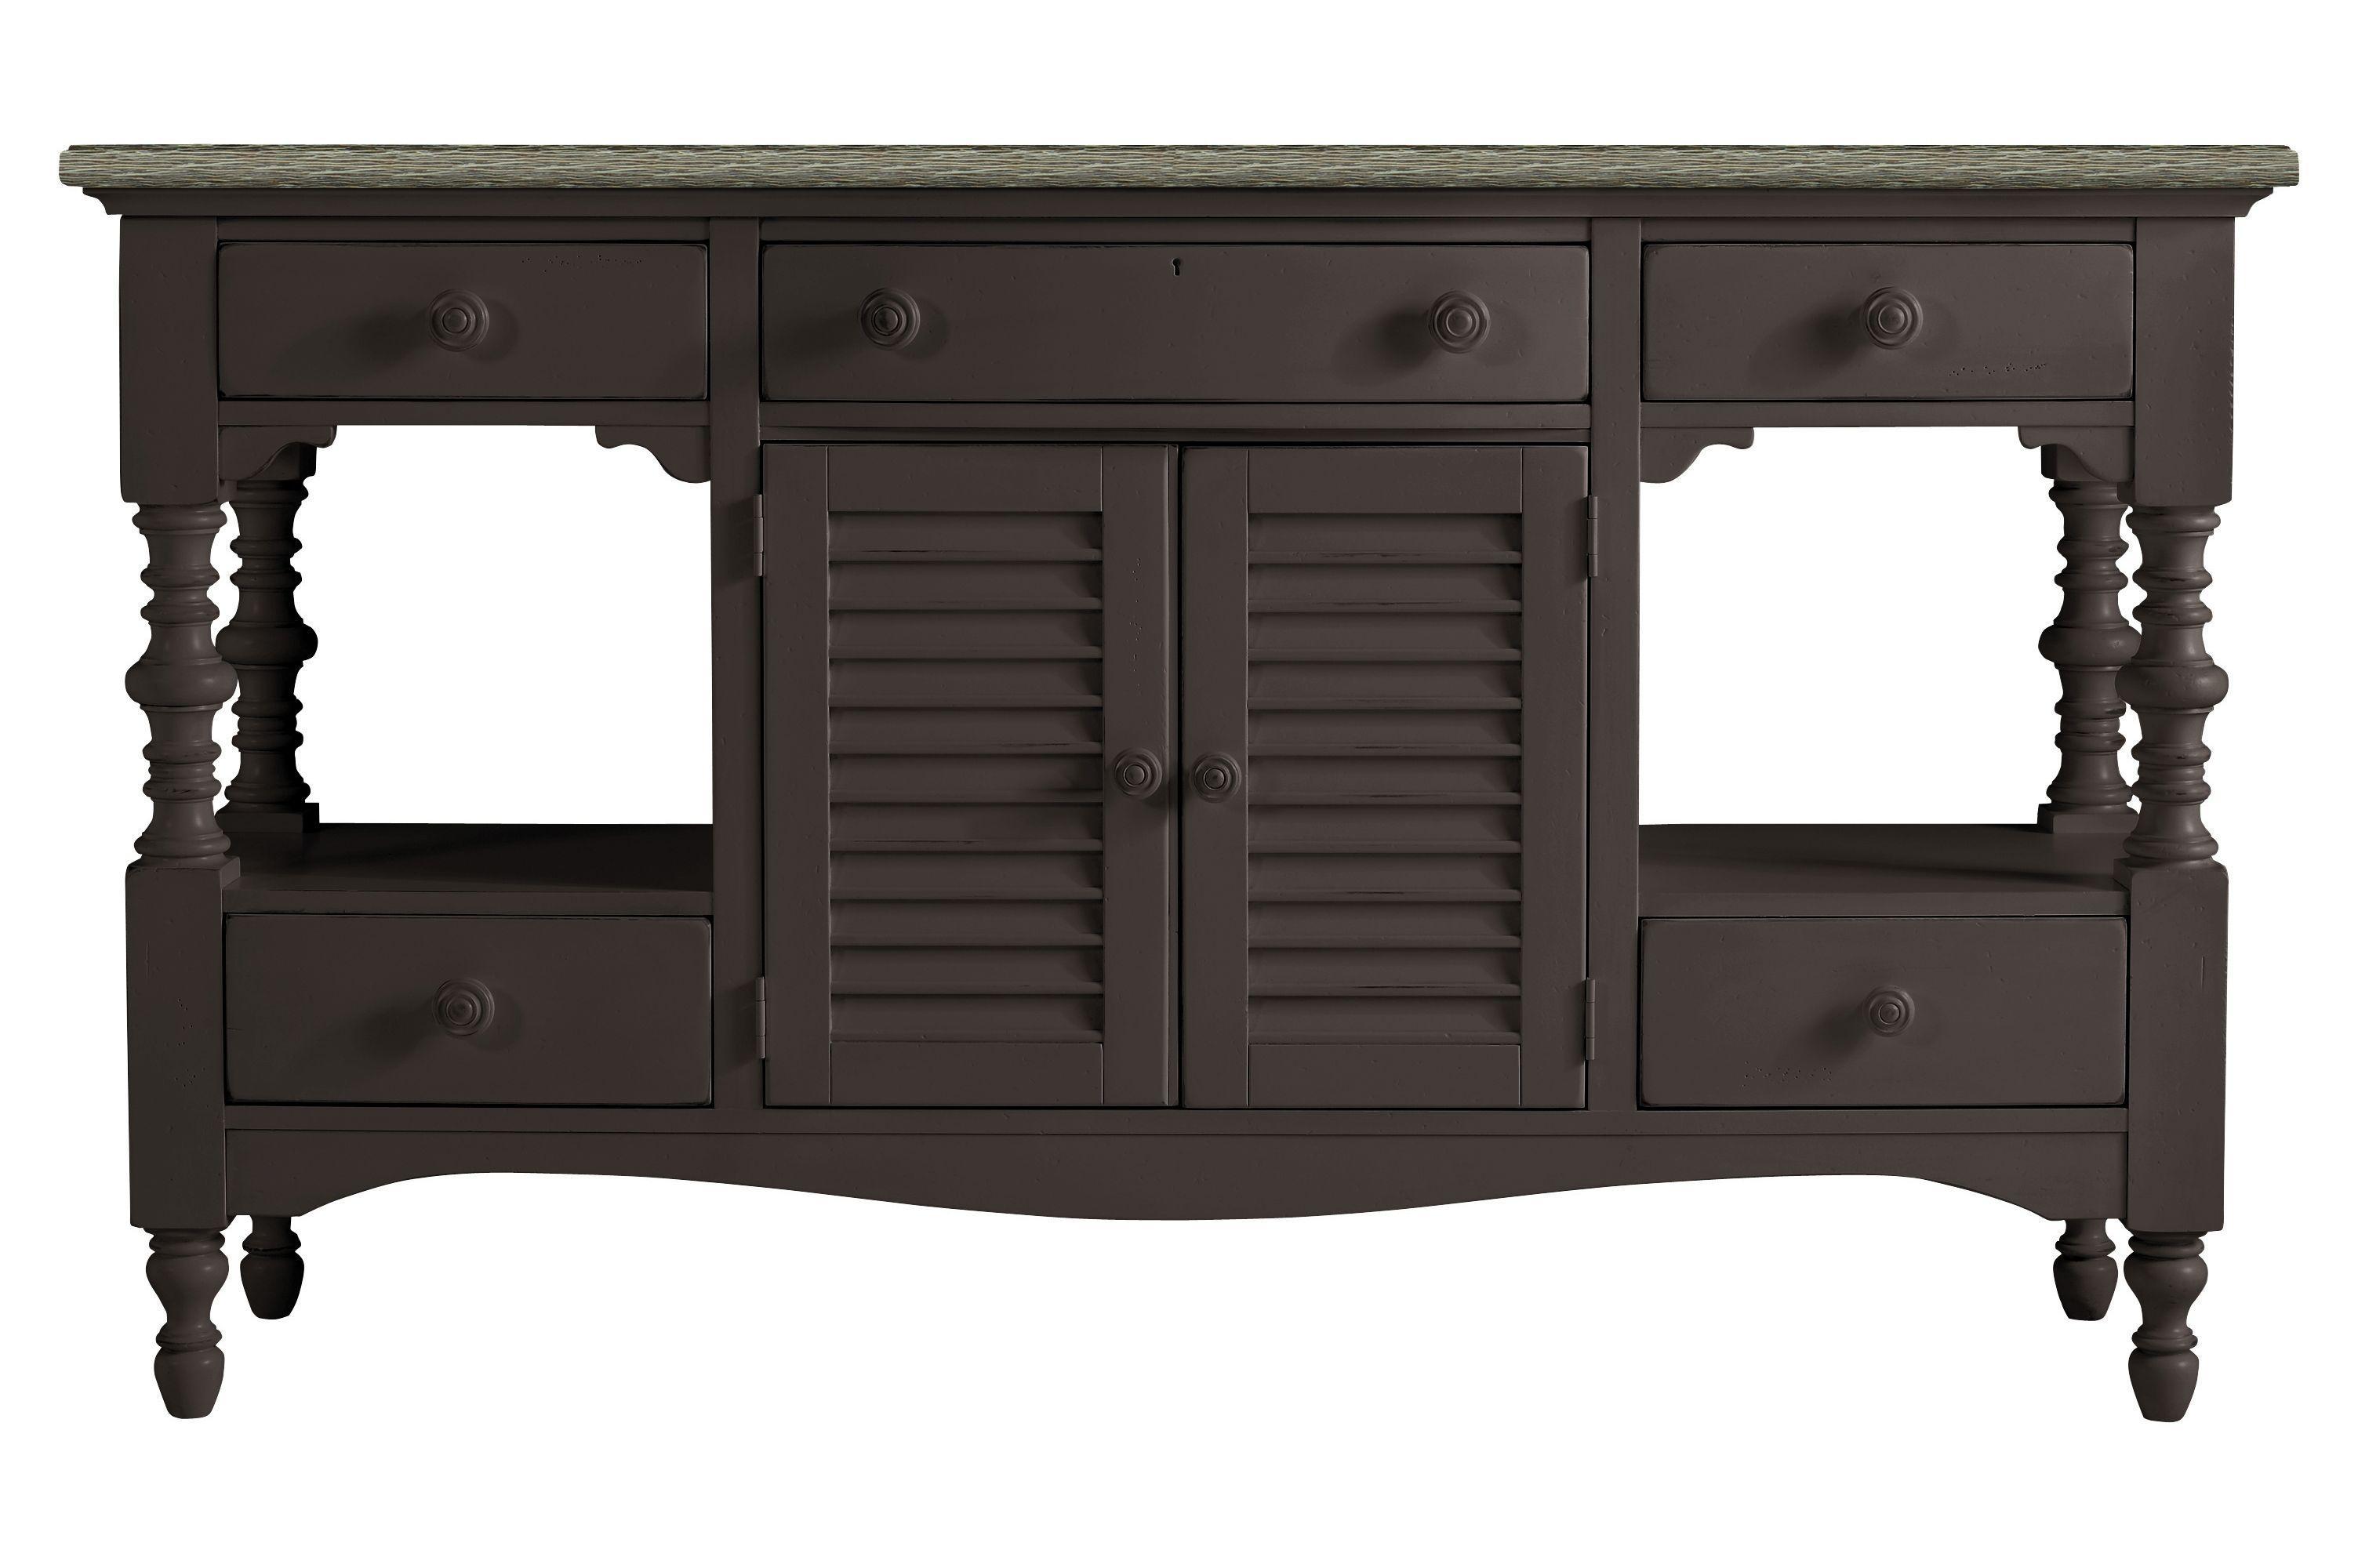 Stanley Furniture Coastal Living Retreat Buffet - Item Number: 411-81-05